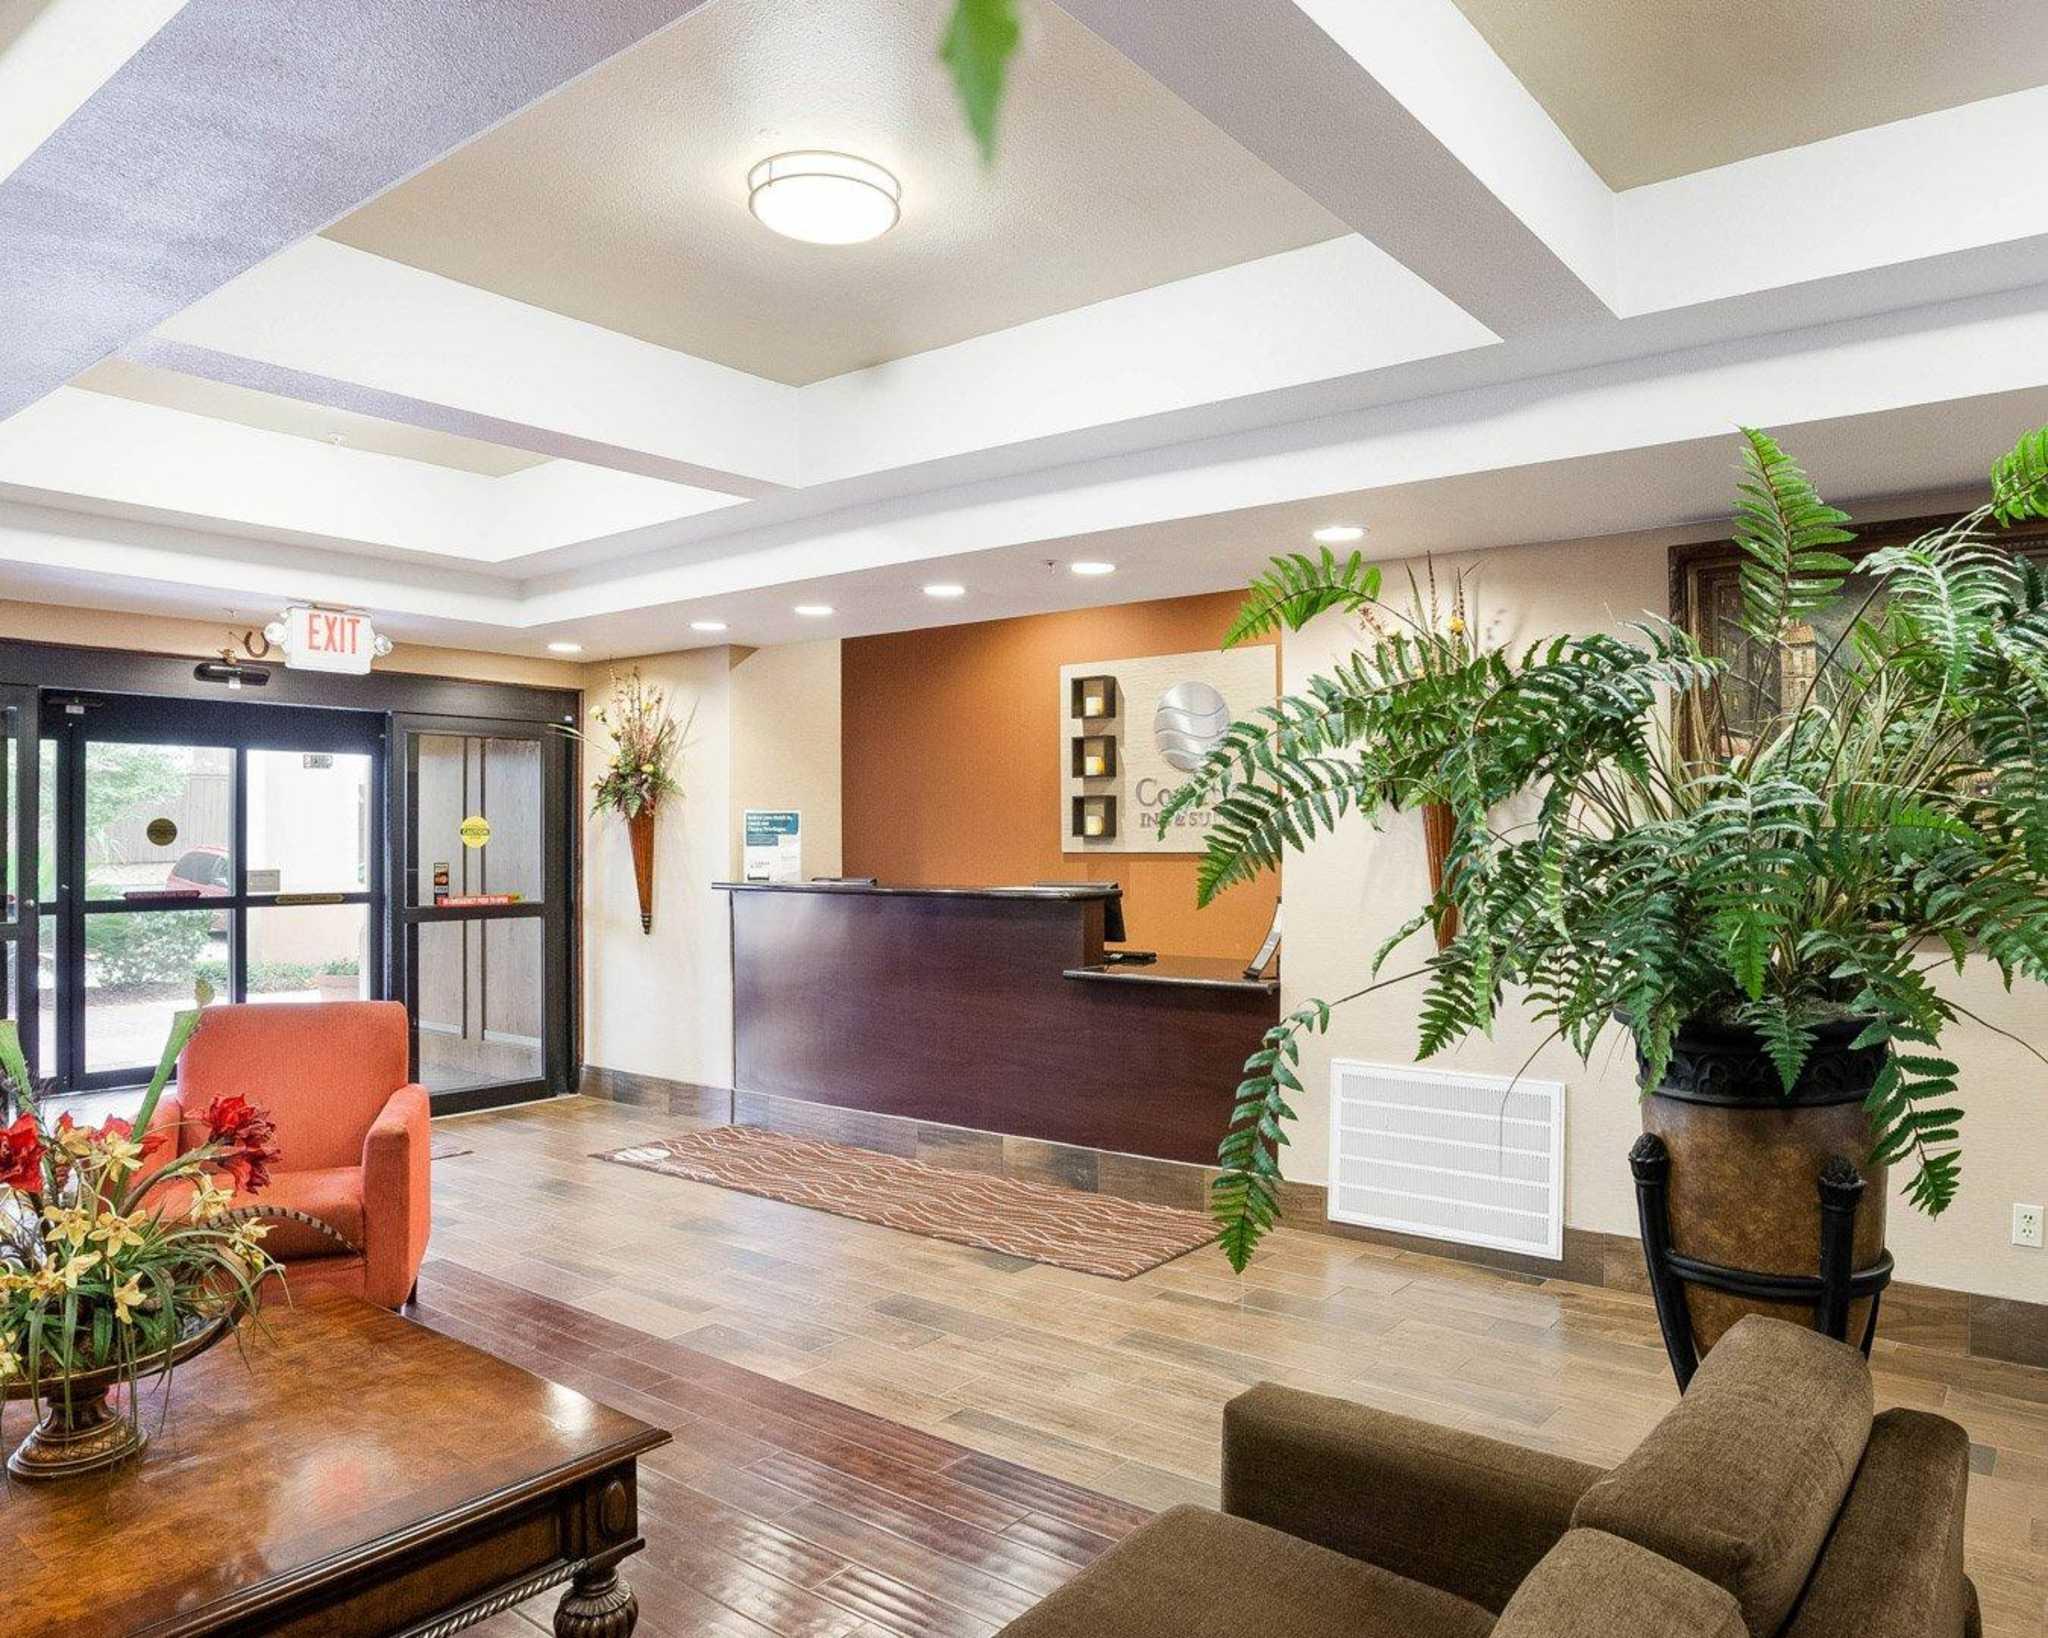 Comfort Inn & Suites Near Medical Center image 10